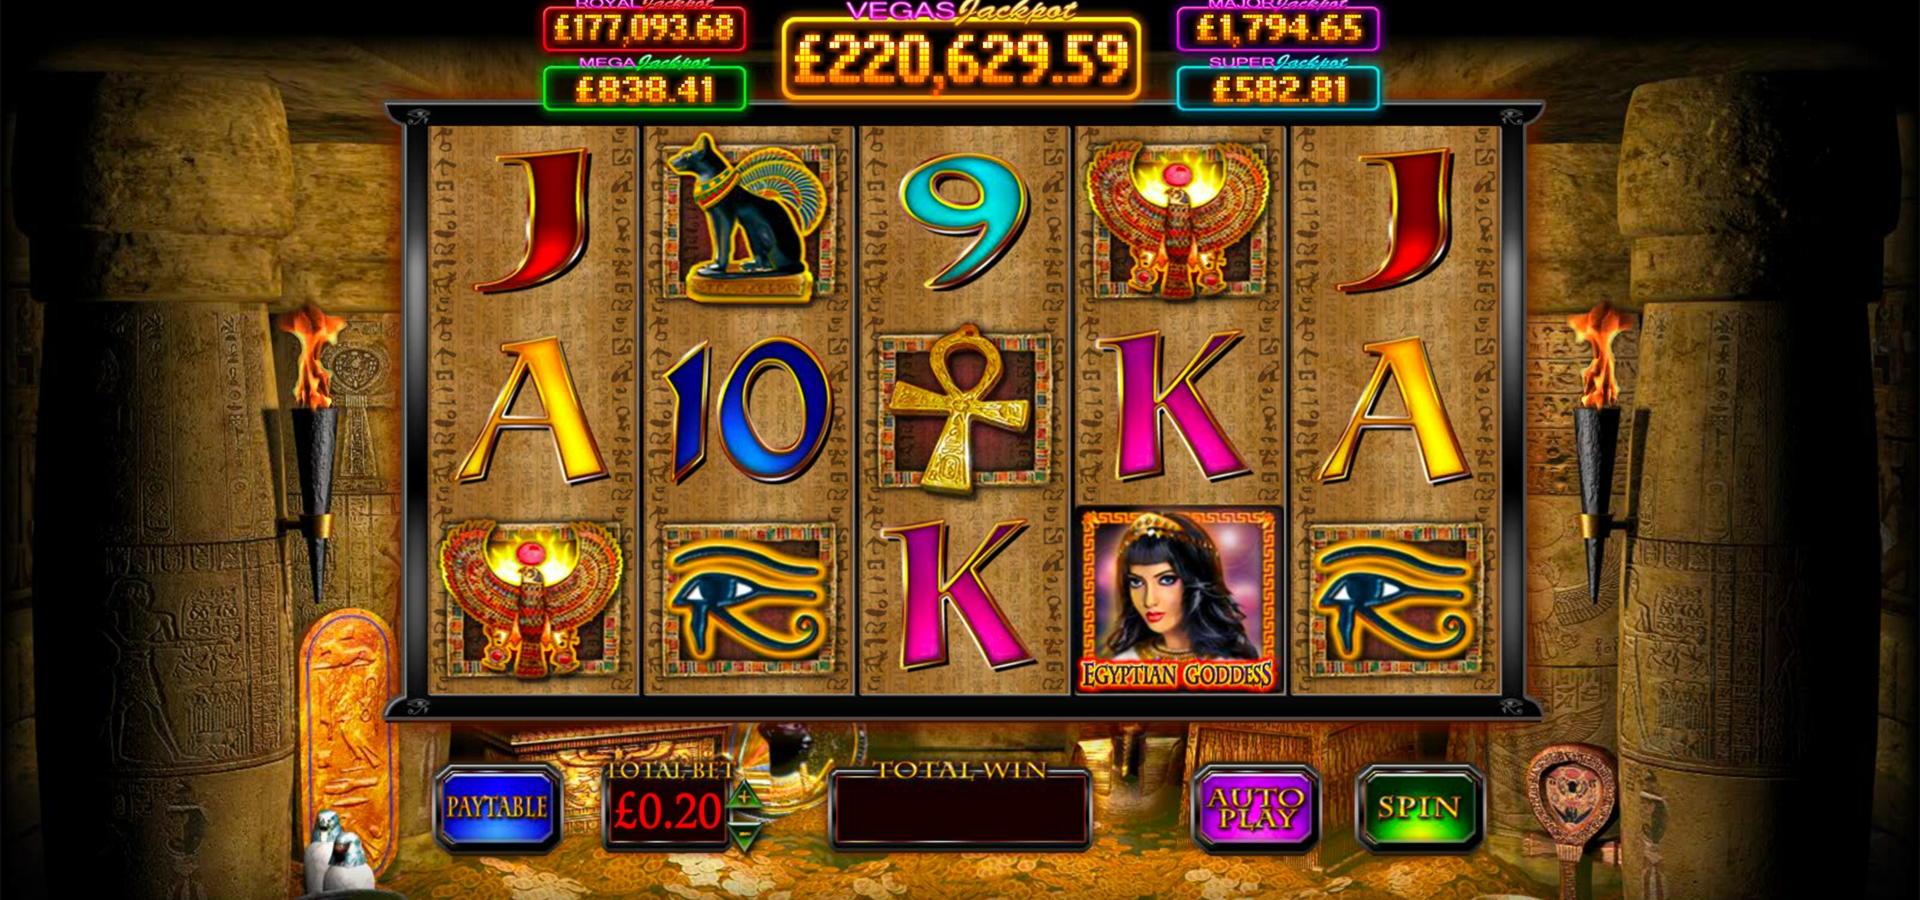 Eur 145 Free Chip Casino at Dream Vegas